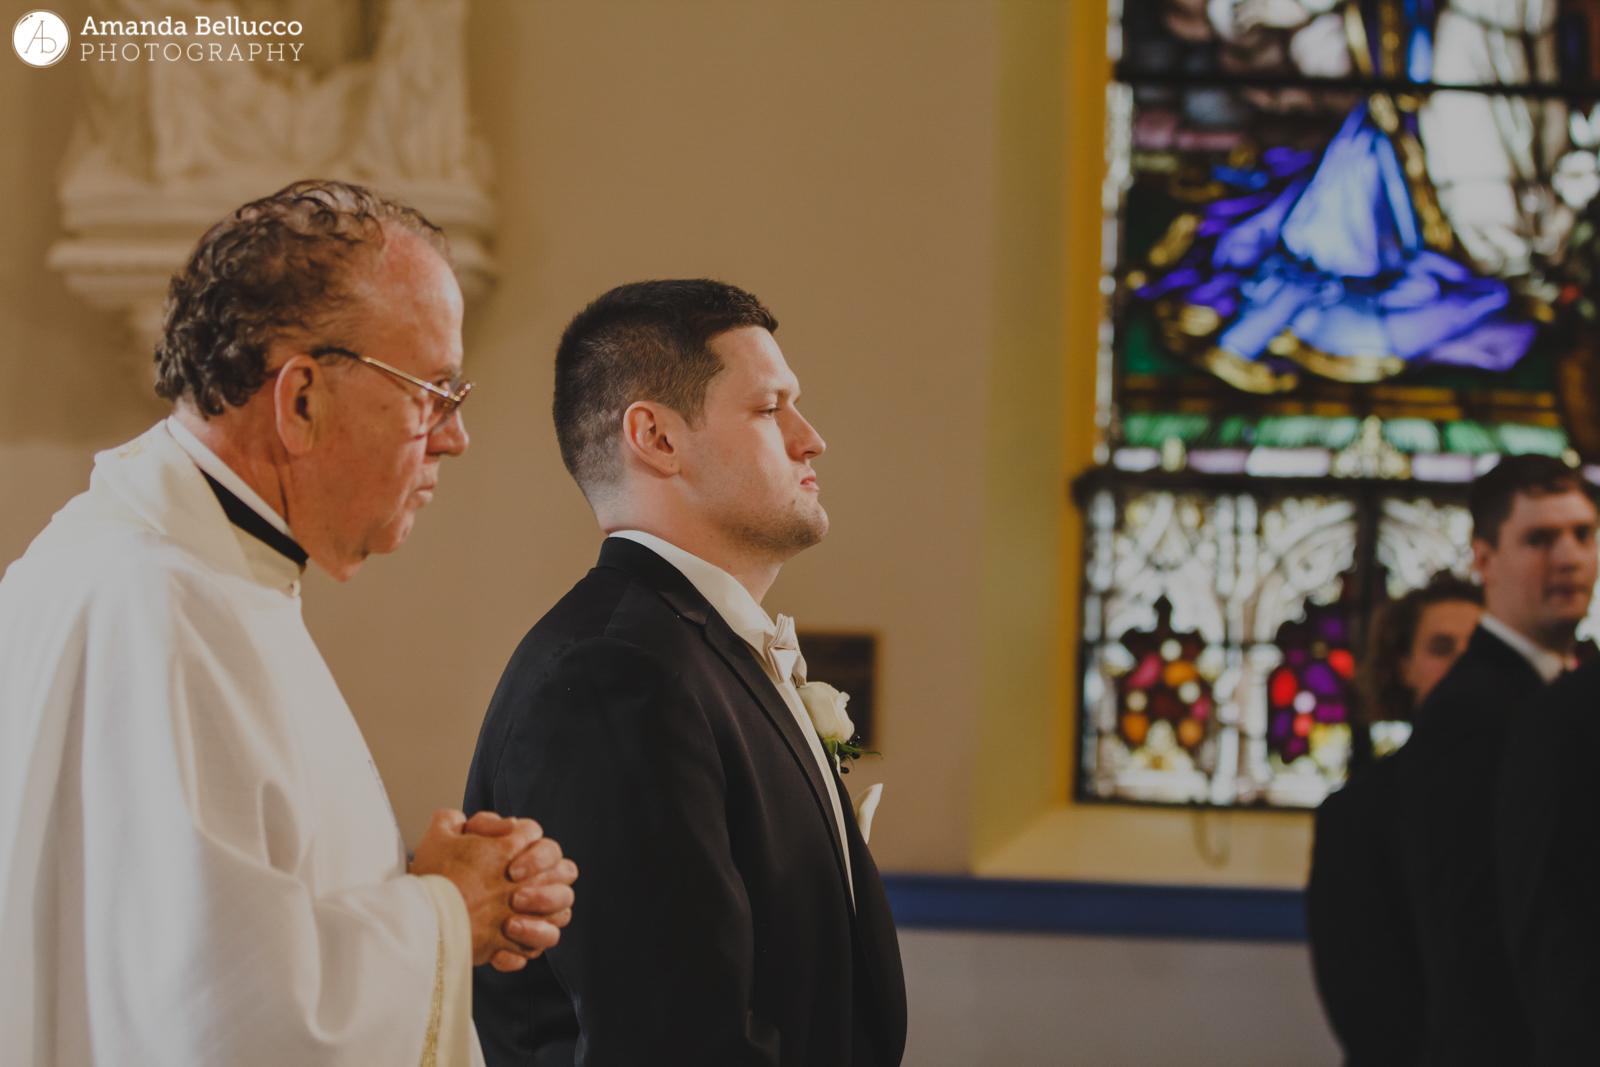 syracuse-rochester-fine-art-wedding-photographer-31.JPG